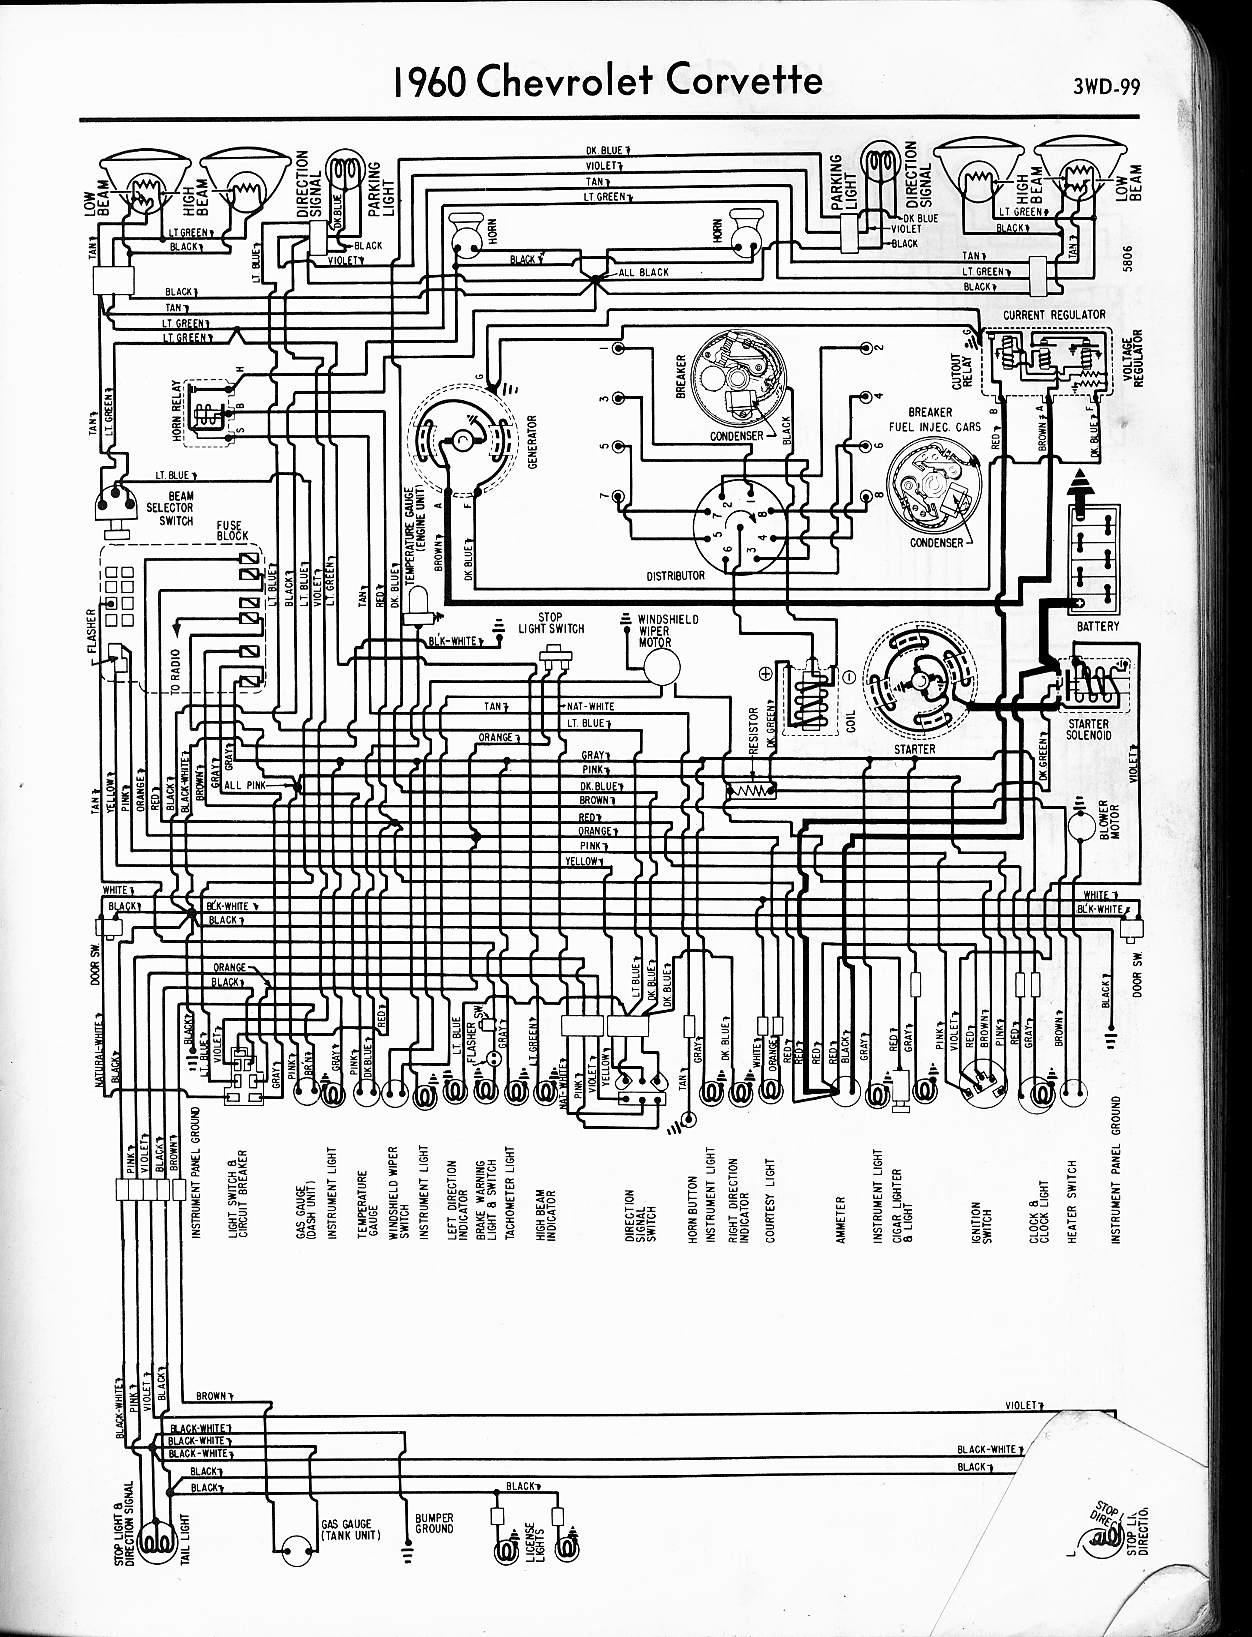 1961 corvair wiring diagram